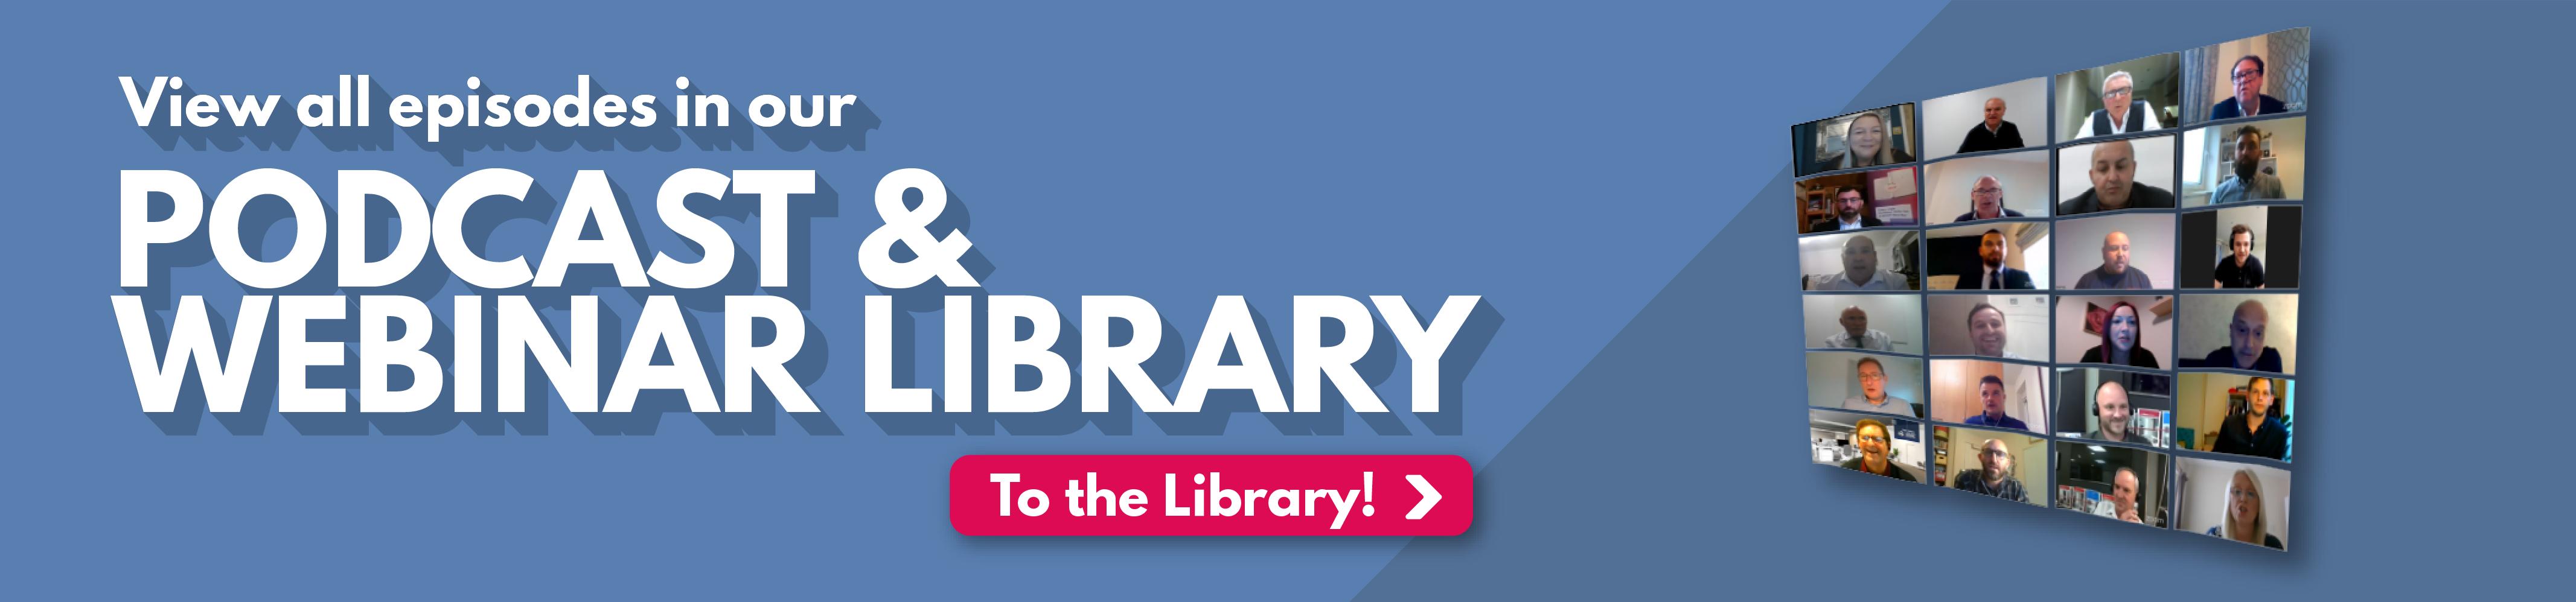 Webinar Library Footer